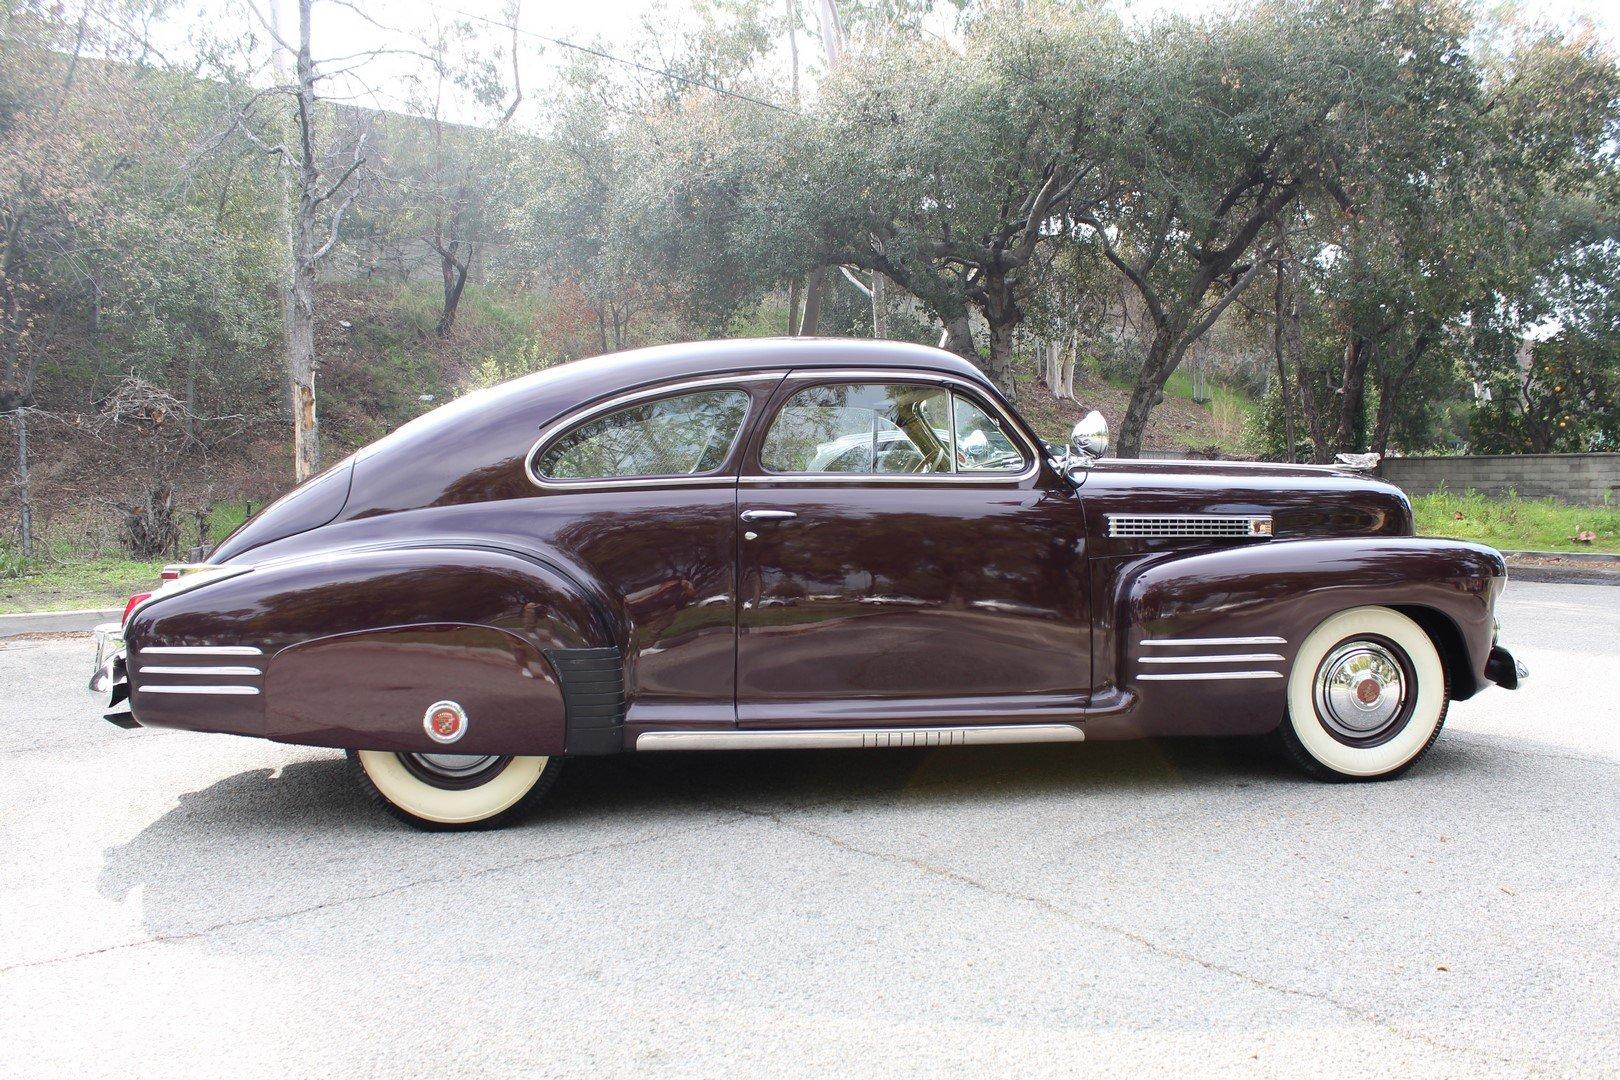 1941 Cadillac 2 dr. Sedanette